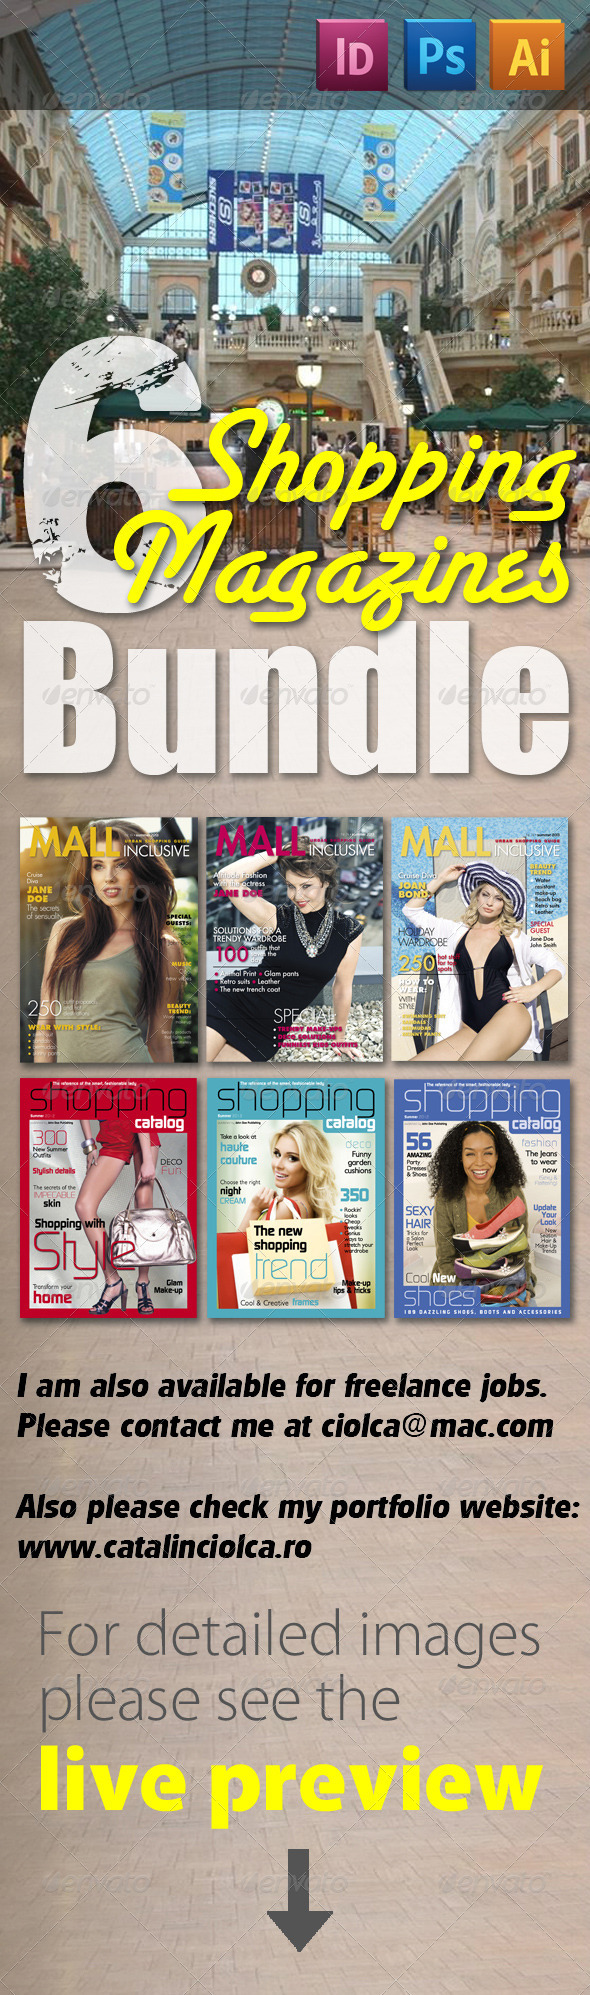 GraphicRiver 6 Shopping Magazines Bundle 2348328